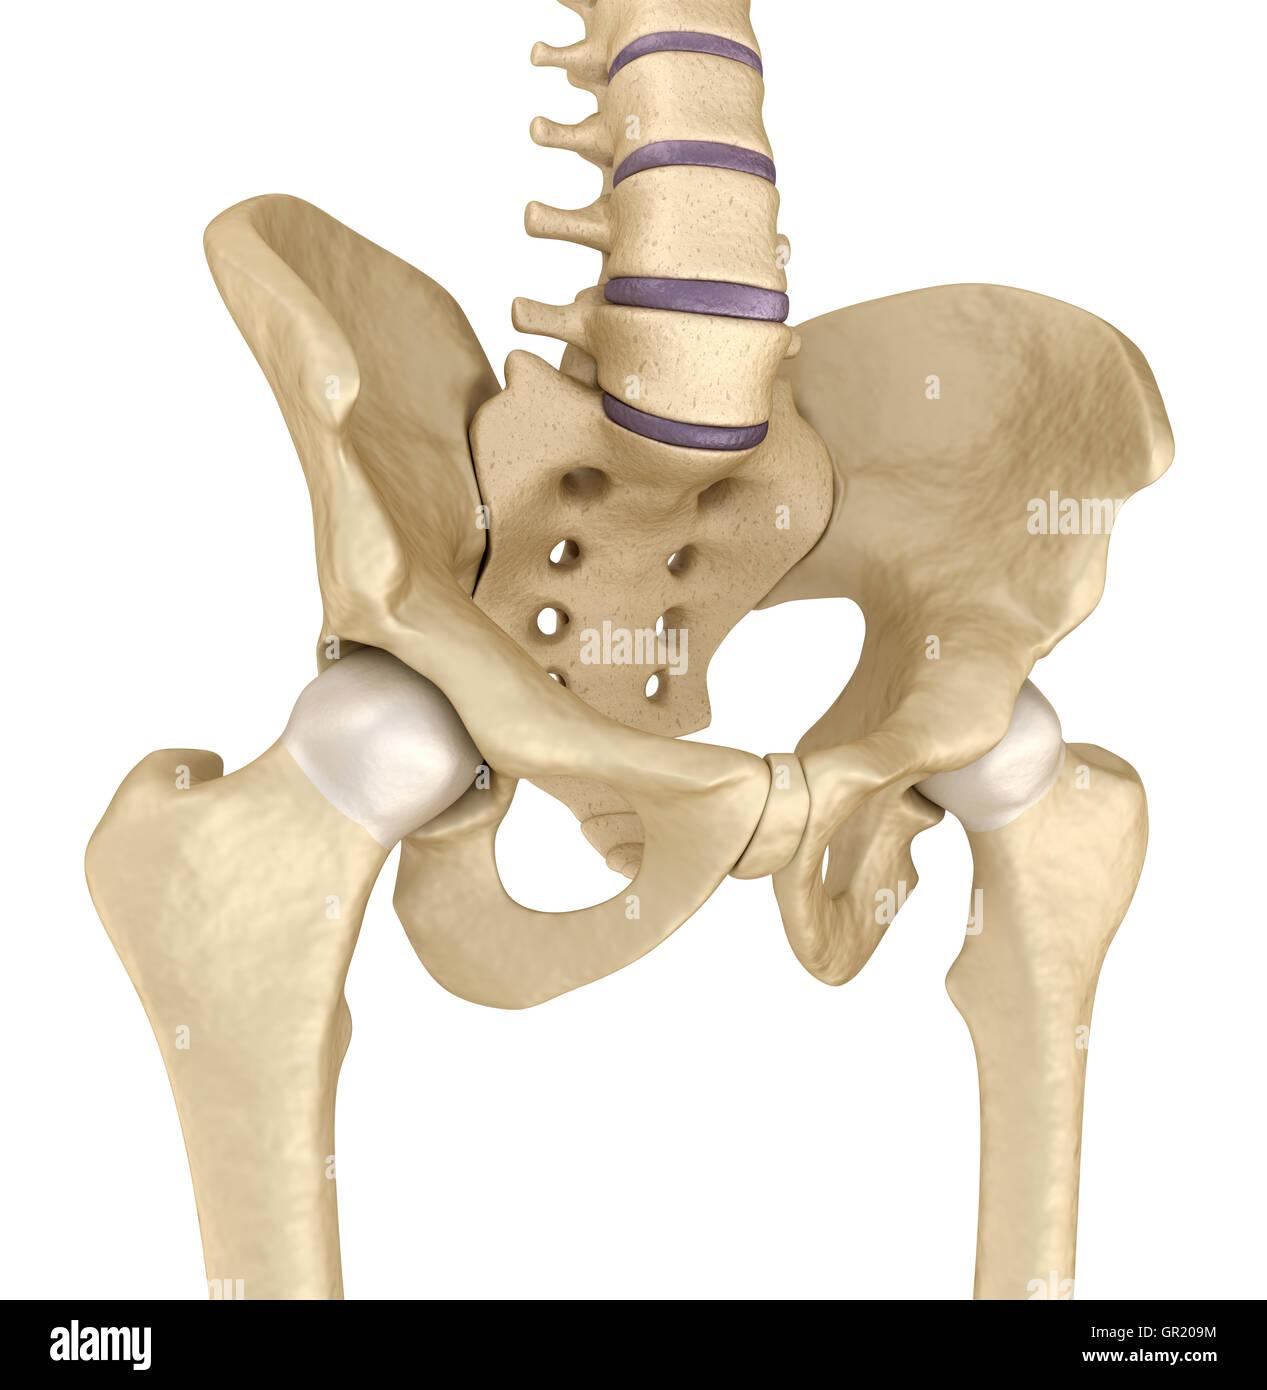 Pelvic Bones Stockfotos & Pelvic Bones Bilder - Seite 2 - Alamy